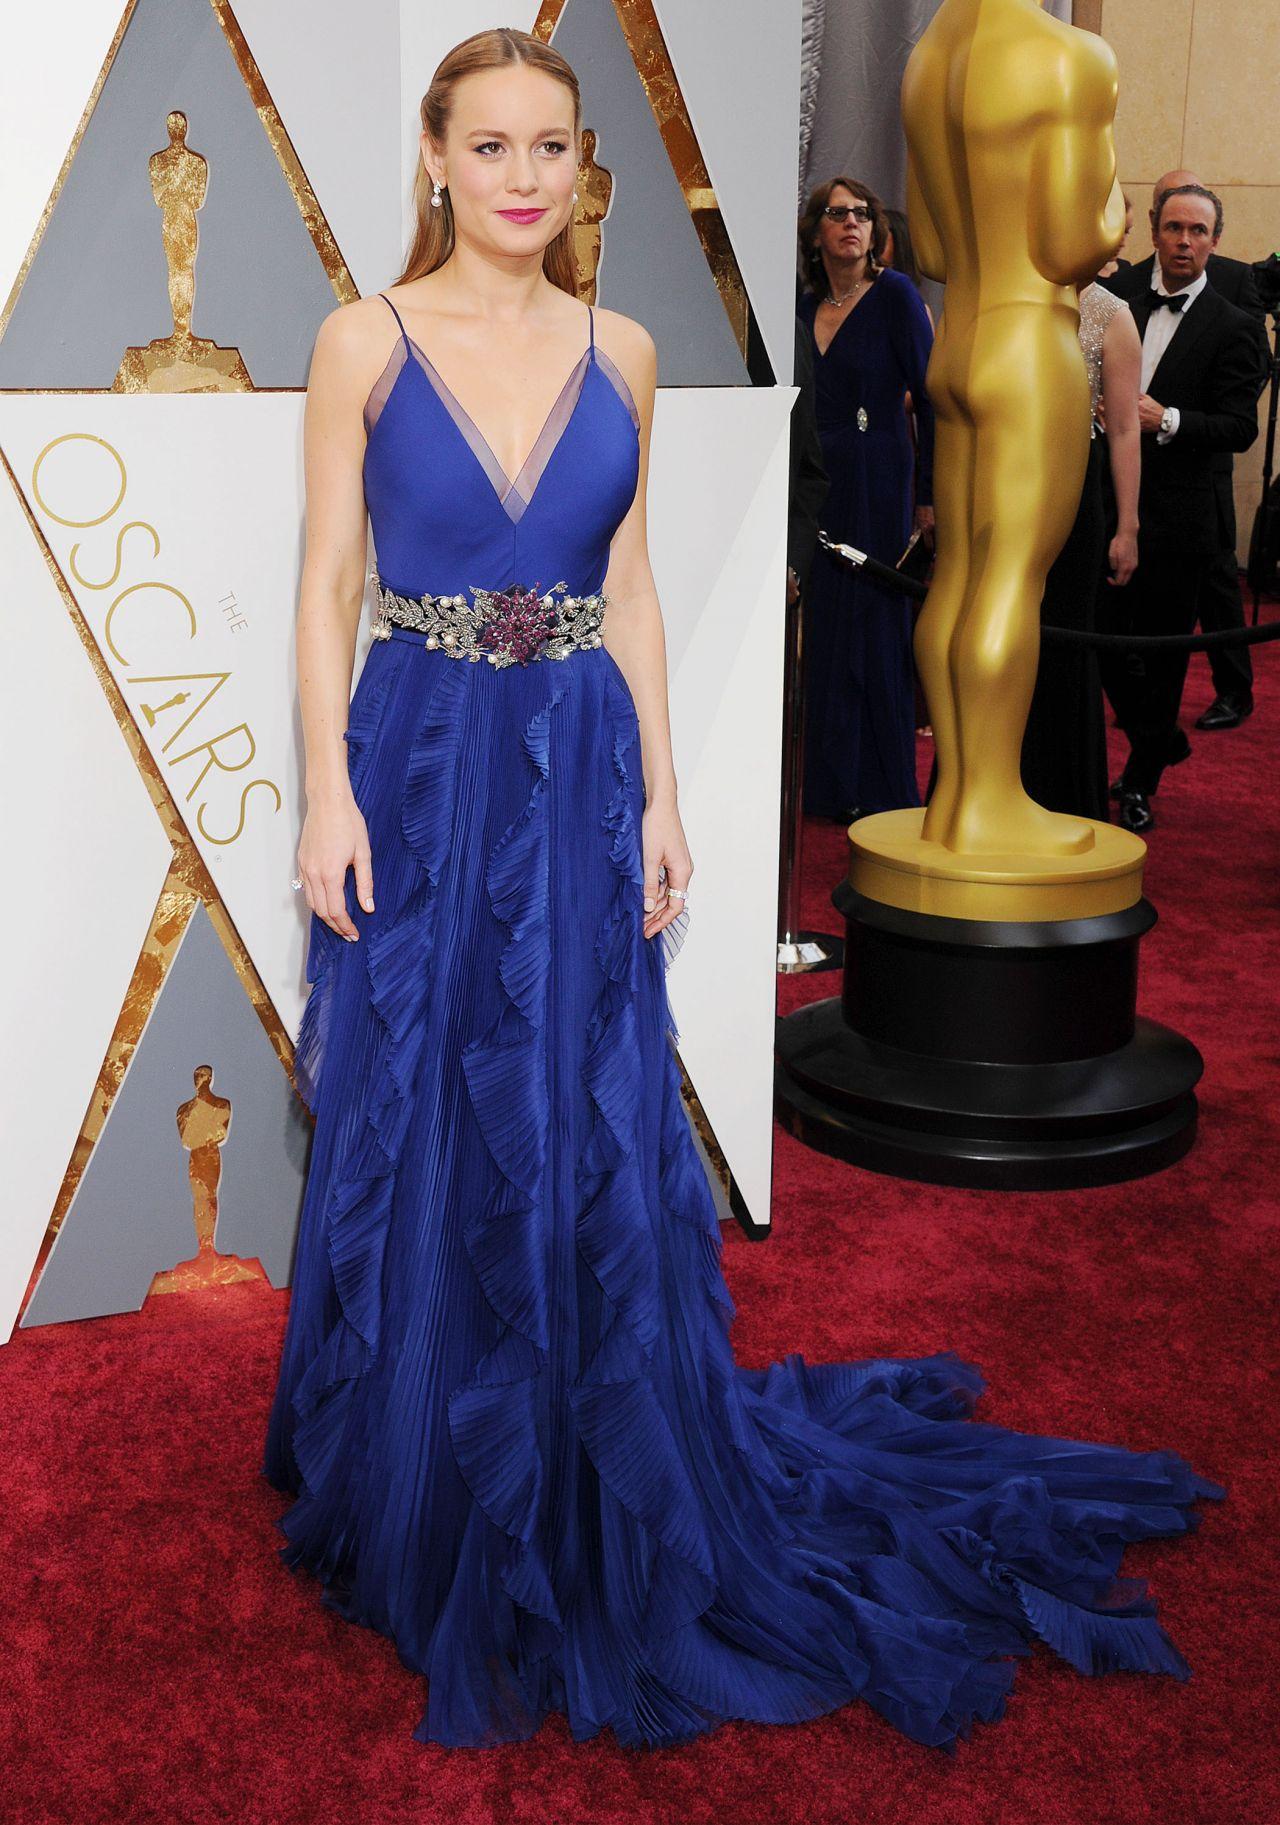 Brie Larson 2016 Oscar Winner For Best Actress